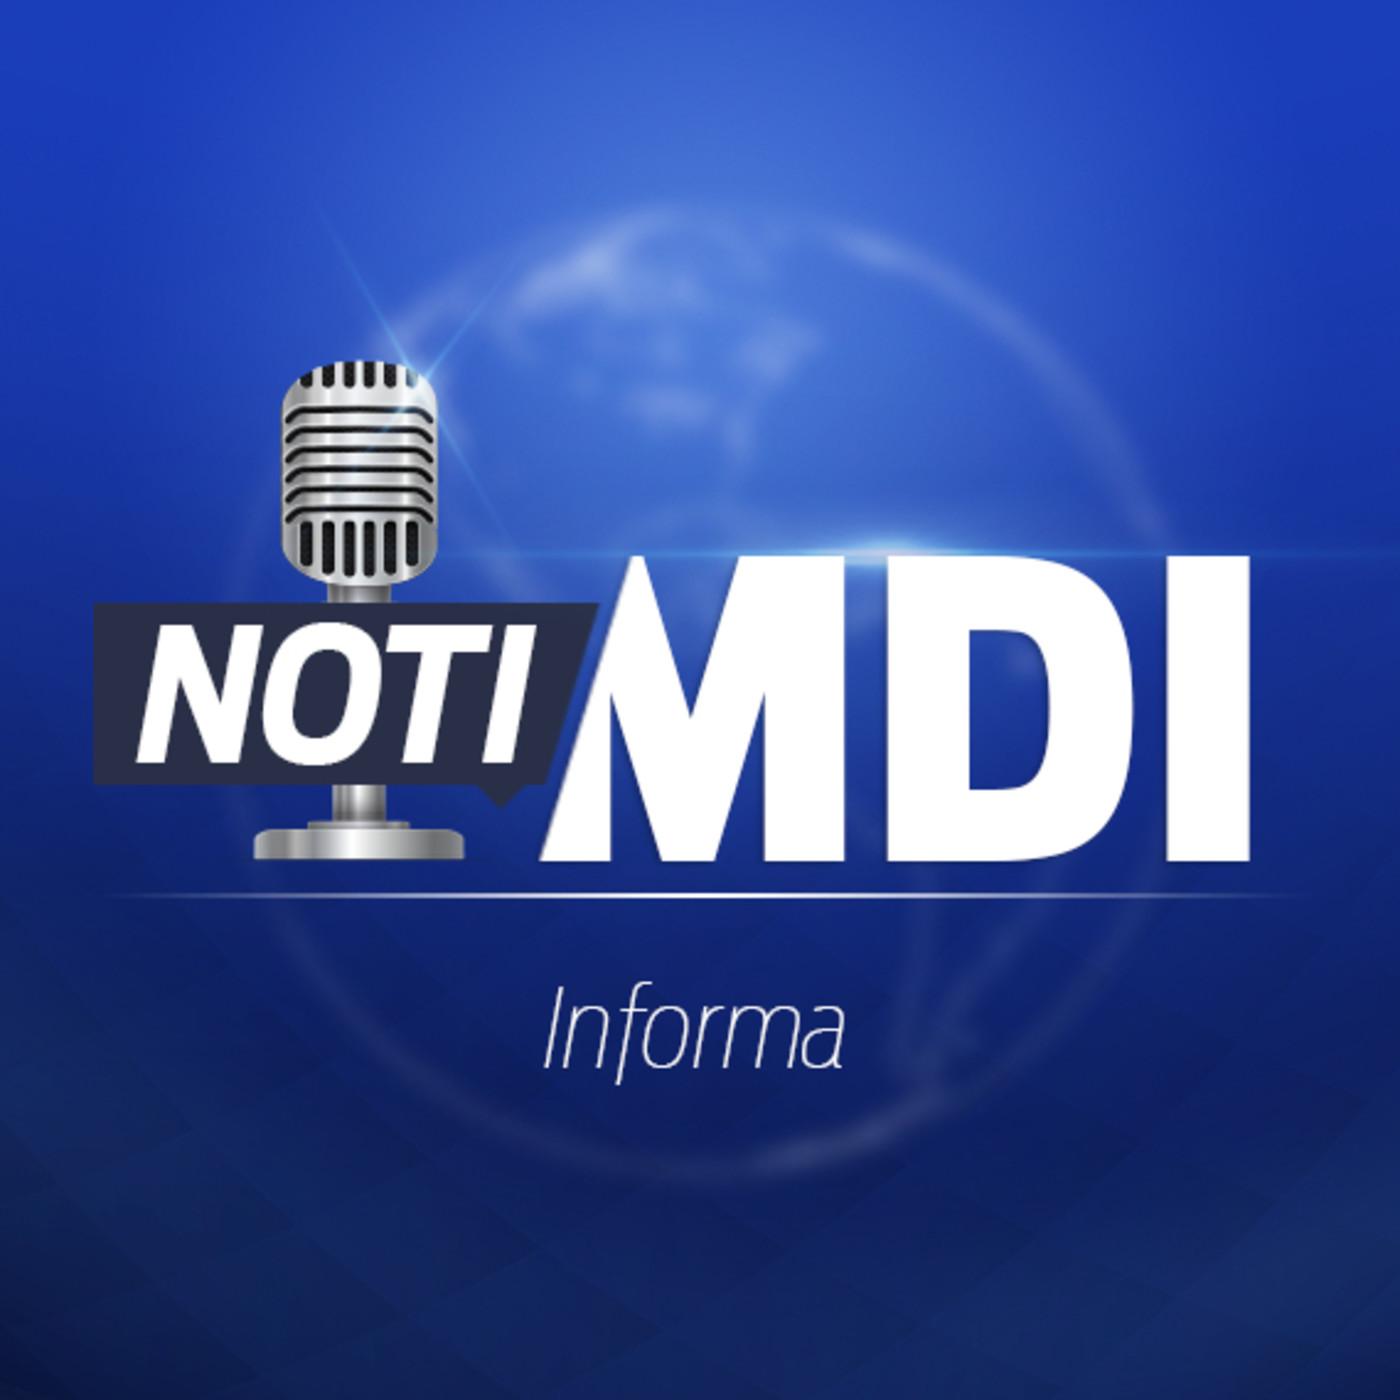 Notimdi el noticiero del ministerio del interior emisi n for Ministerio de interior argentina